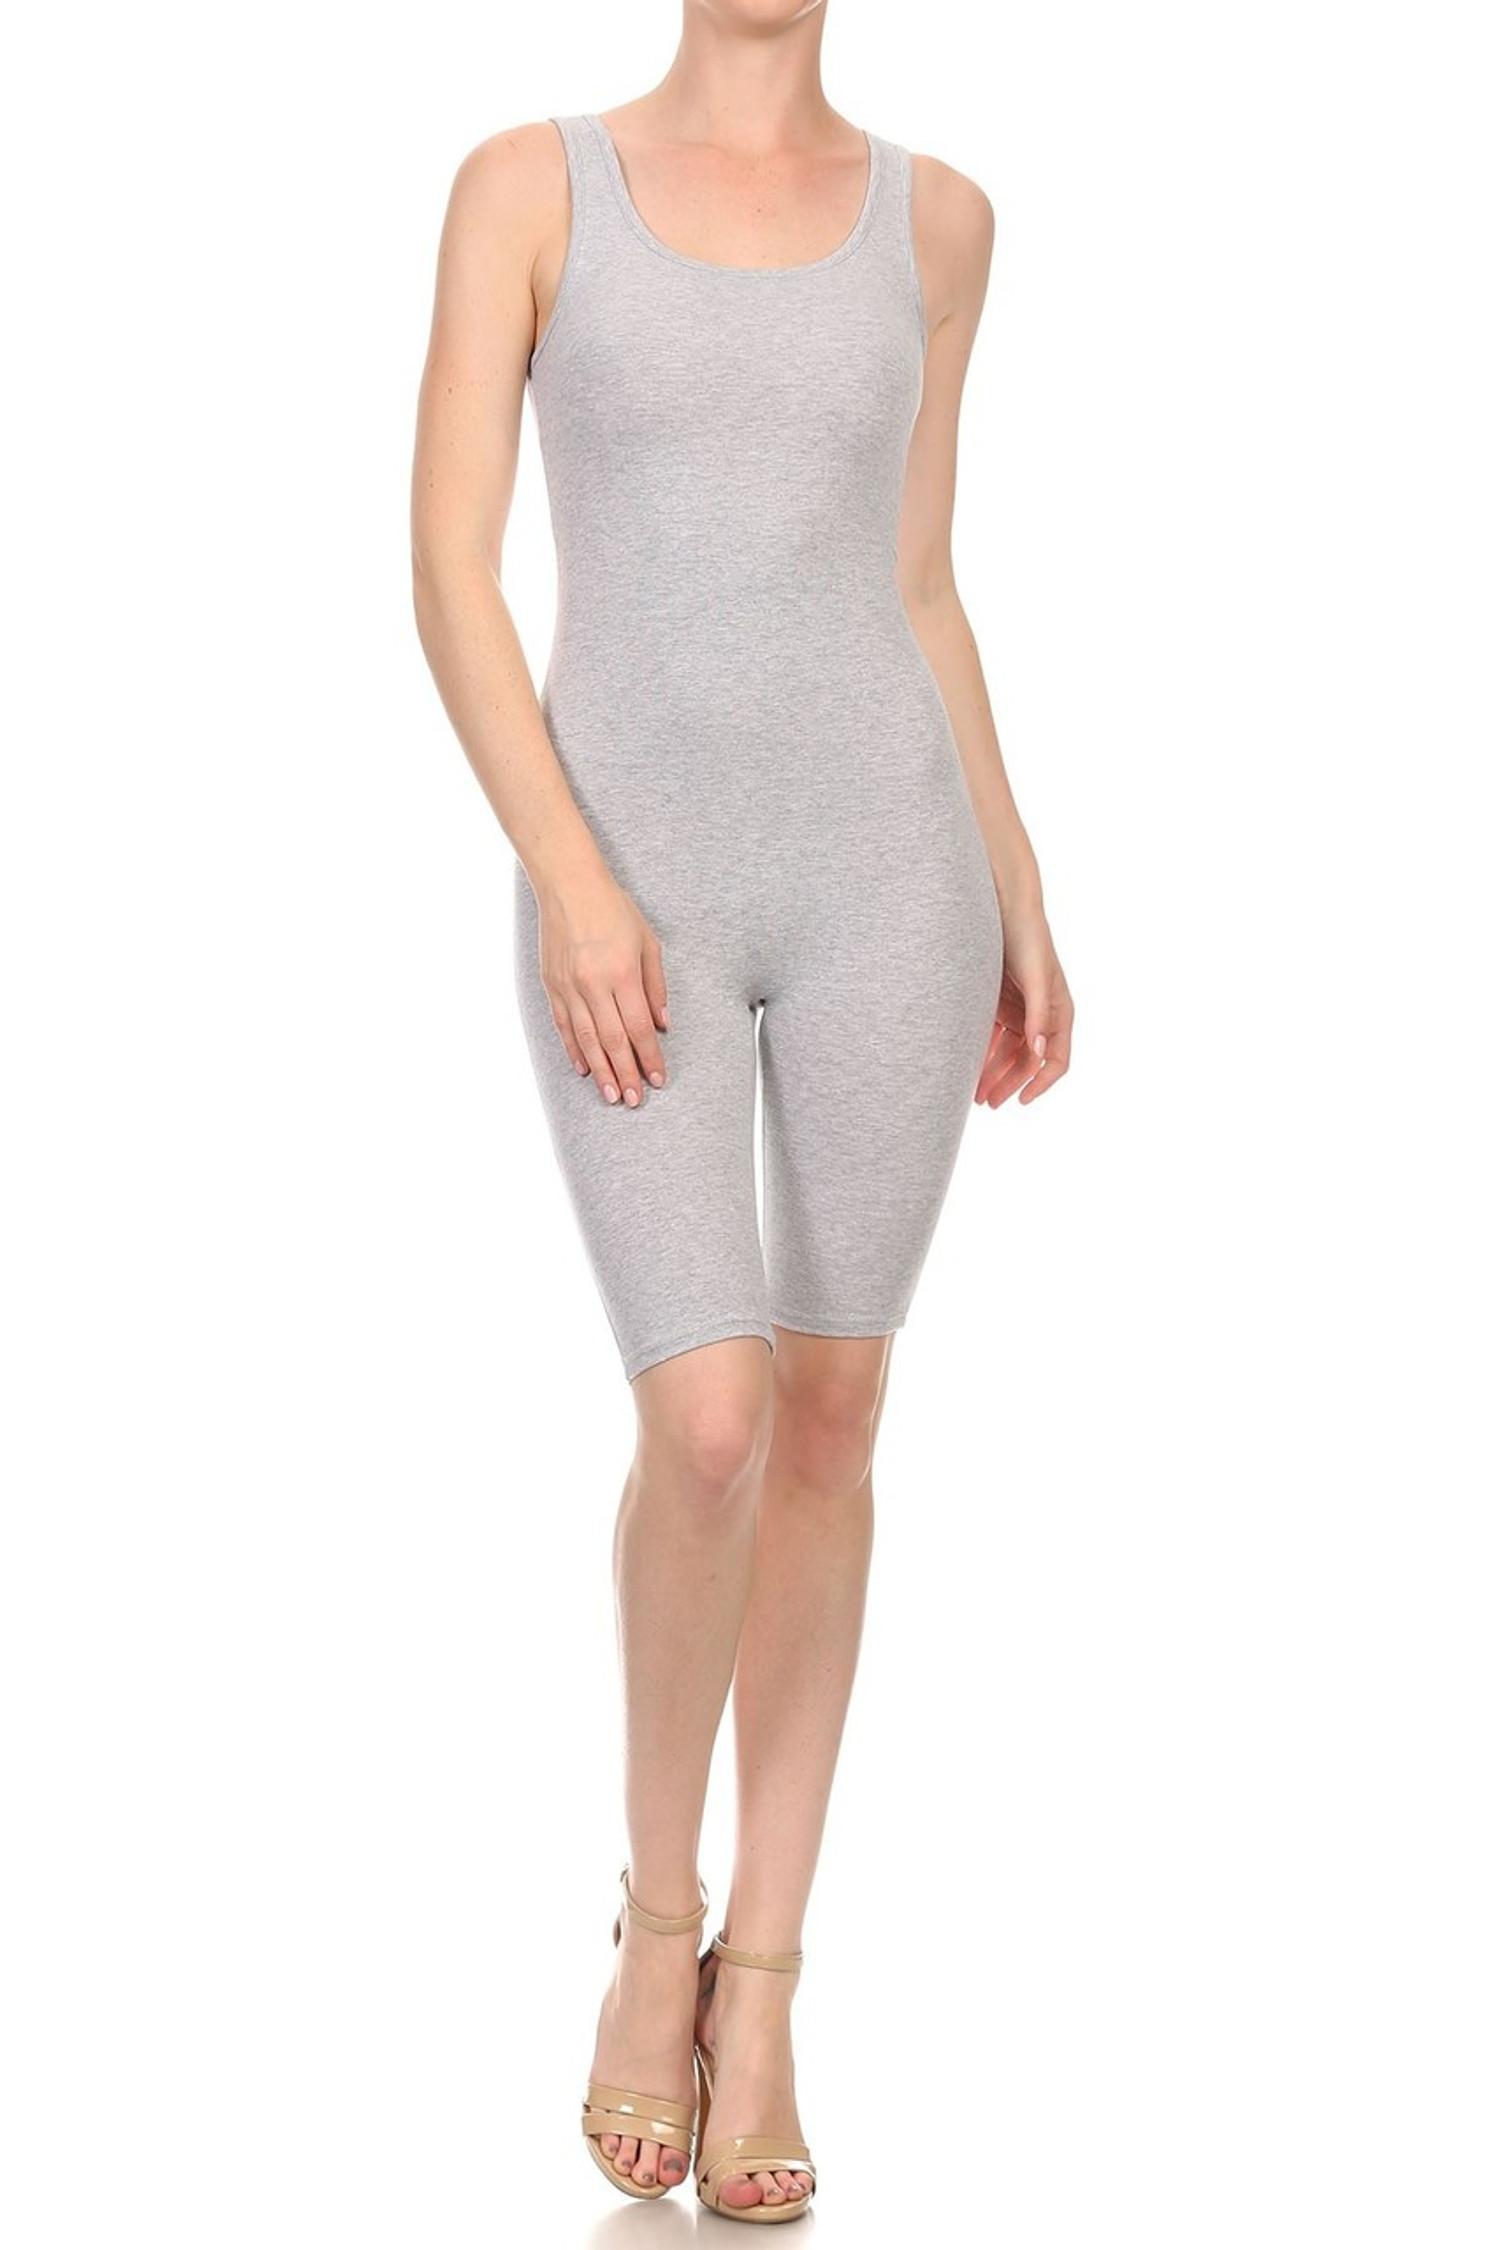 Heather Grey USA Basic Cotton Thigh High Jumpsuit